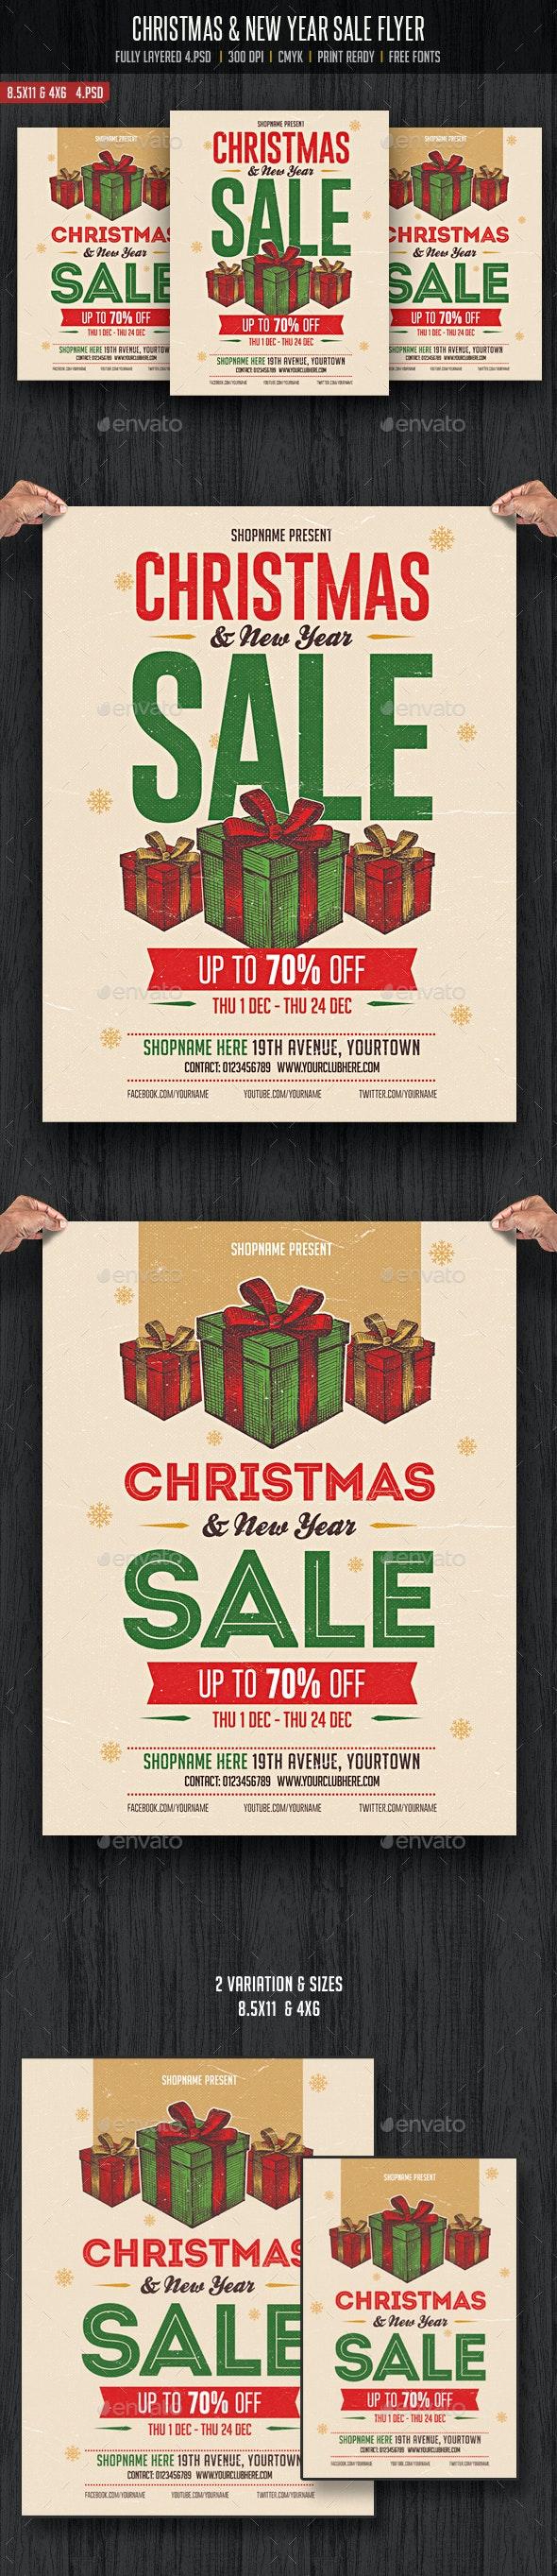 Christmas & New Year Sale Flyer - Flyers Print Templates